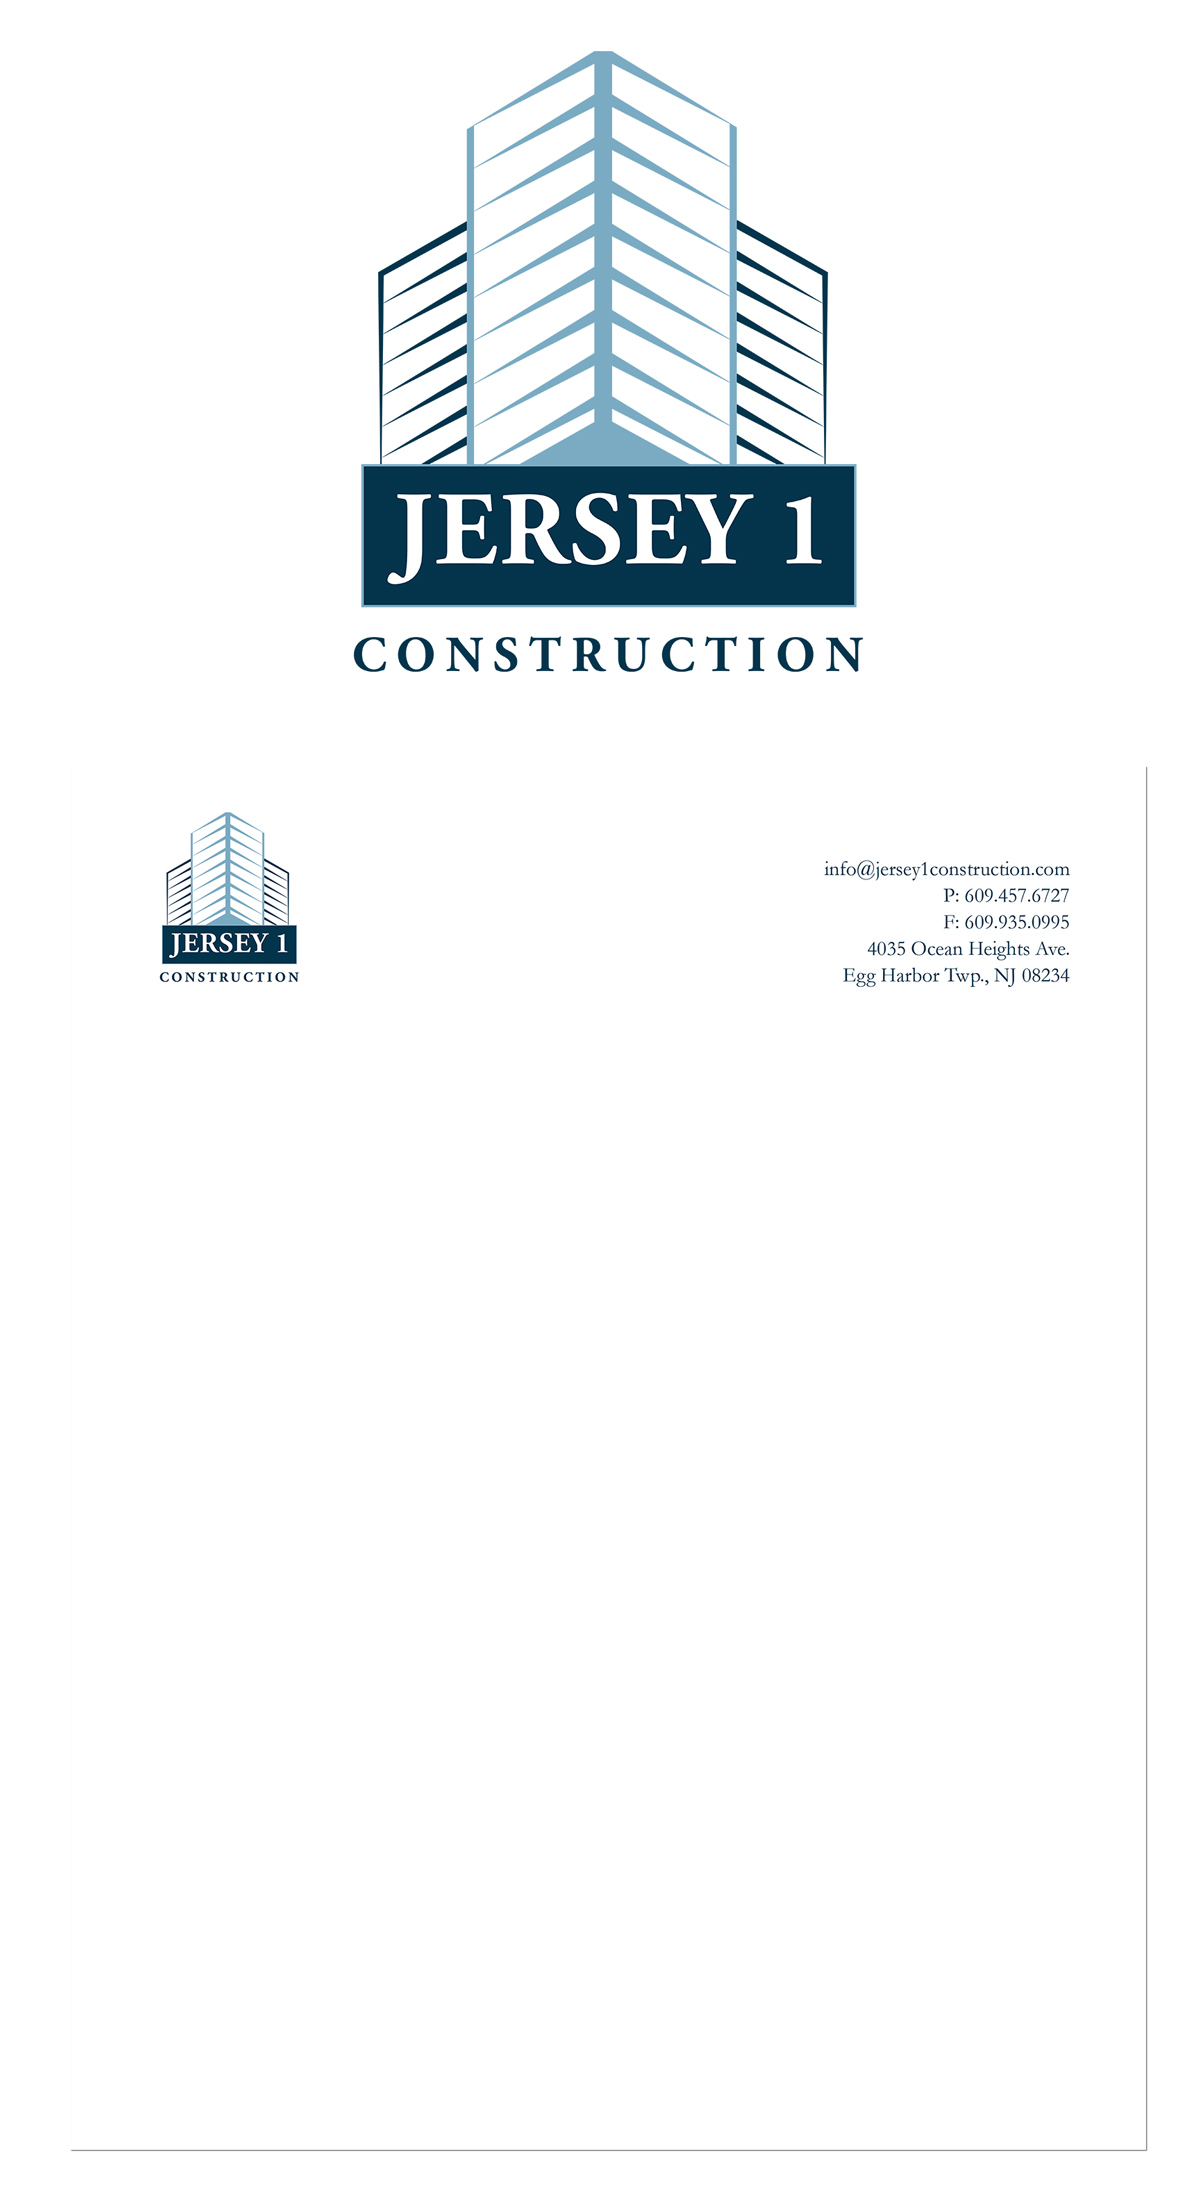 nj union construction logo jersey 1 construction